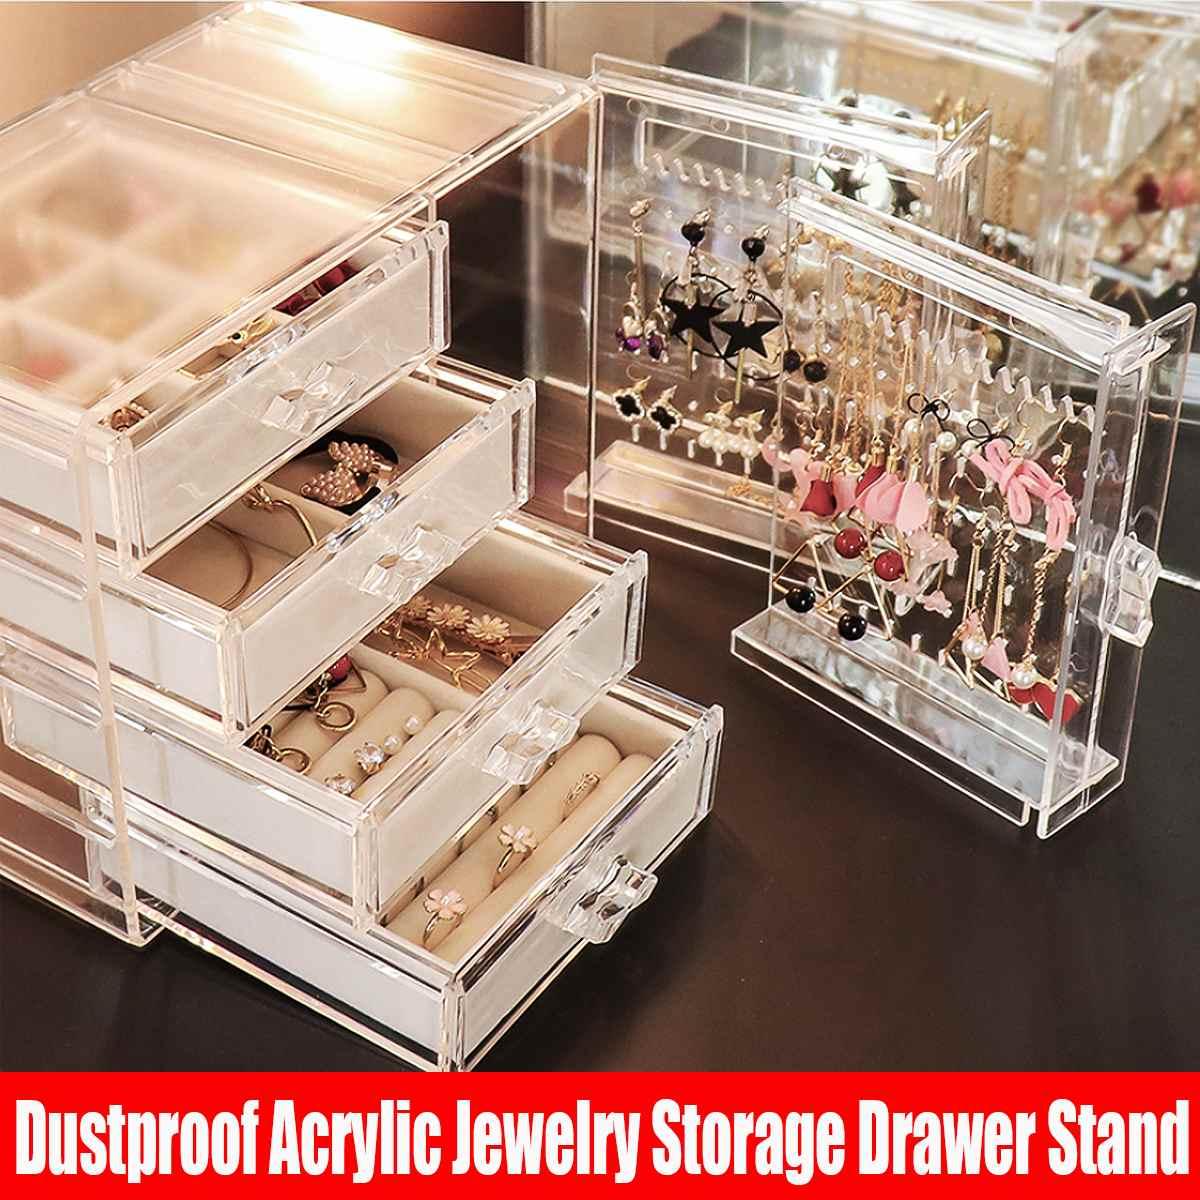 Dustproof Acrylic Jewelry Storage Box Drawer Earrings Display Insert Rack Ring Tray Necklace Bracelet Organizer Case 3 Types Jewelry Packaging Display Aliexpress